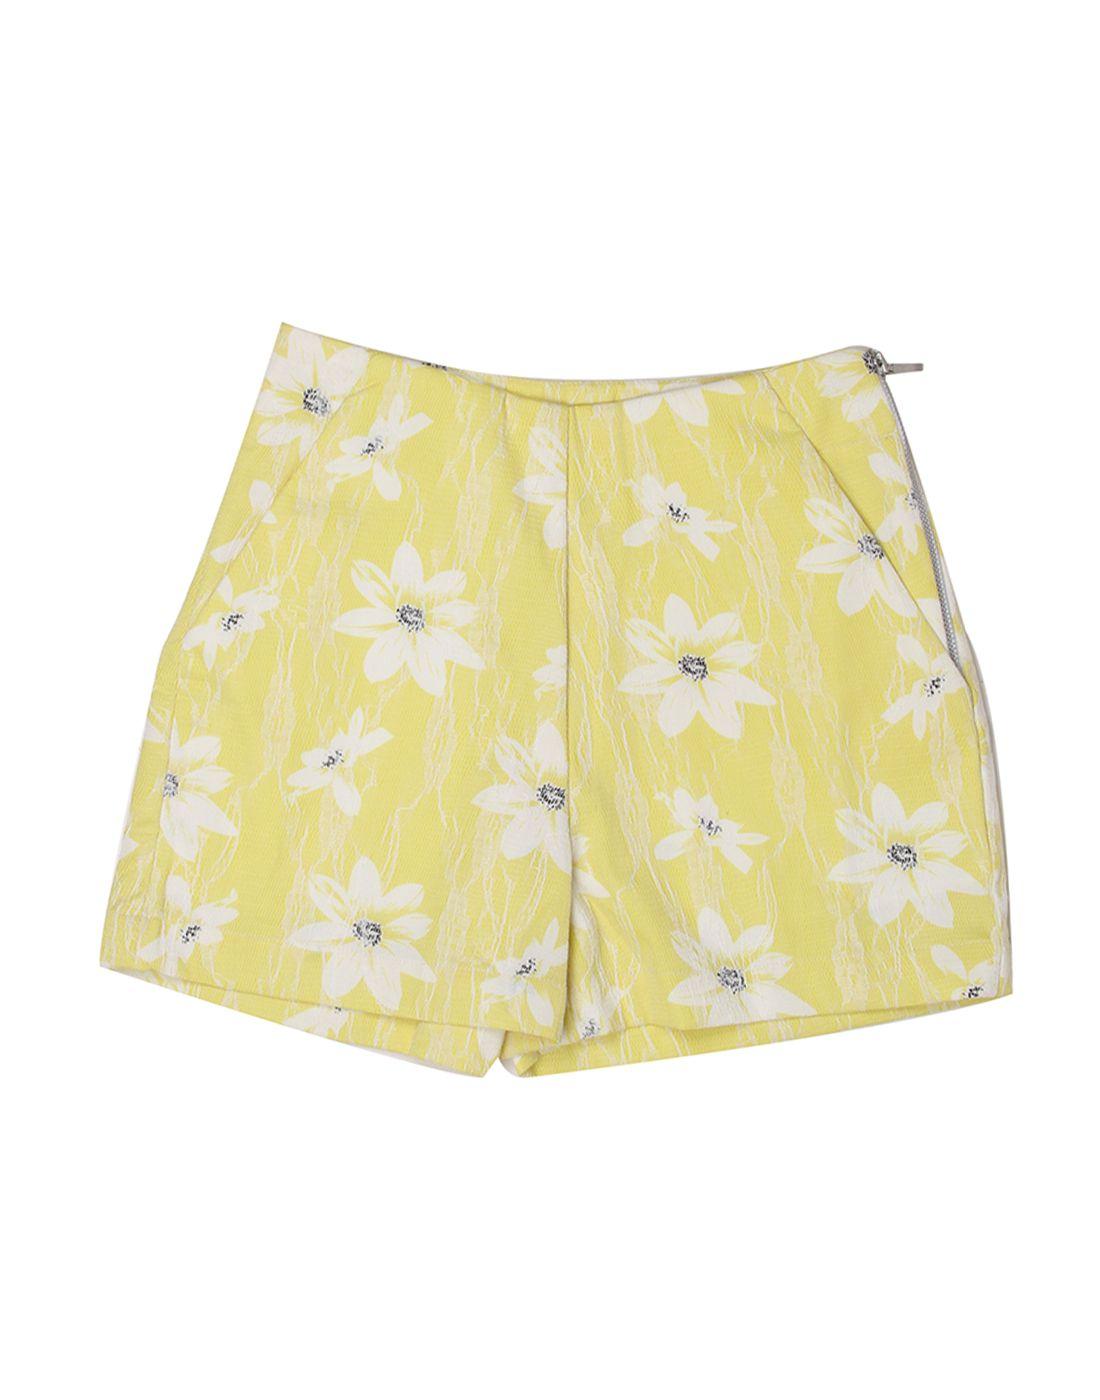 London Fog Girls Yellow  Short